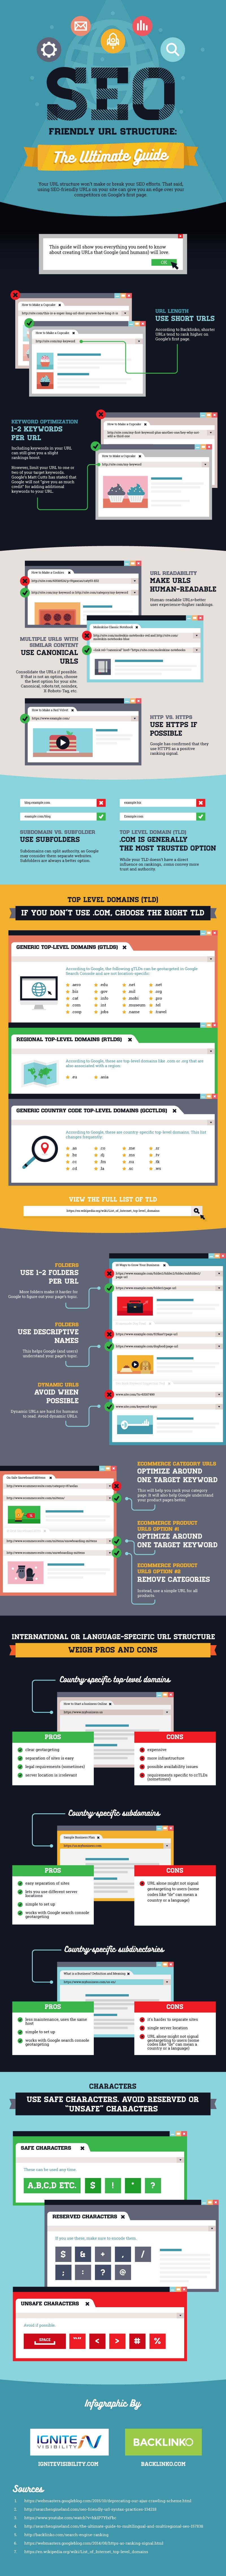 SEO-URL-Structure-infographic.jpg